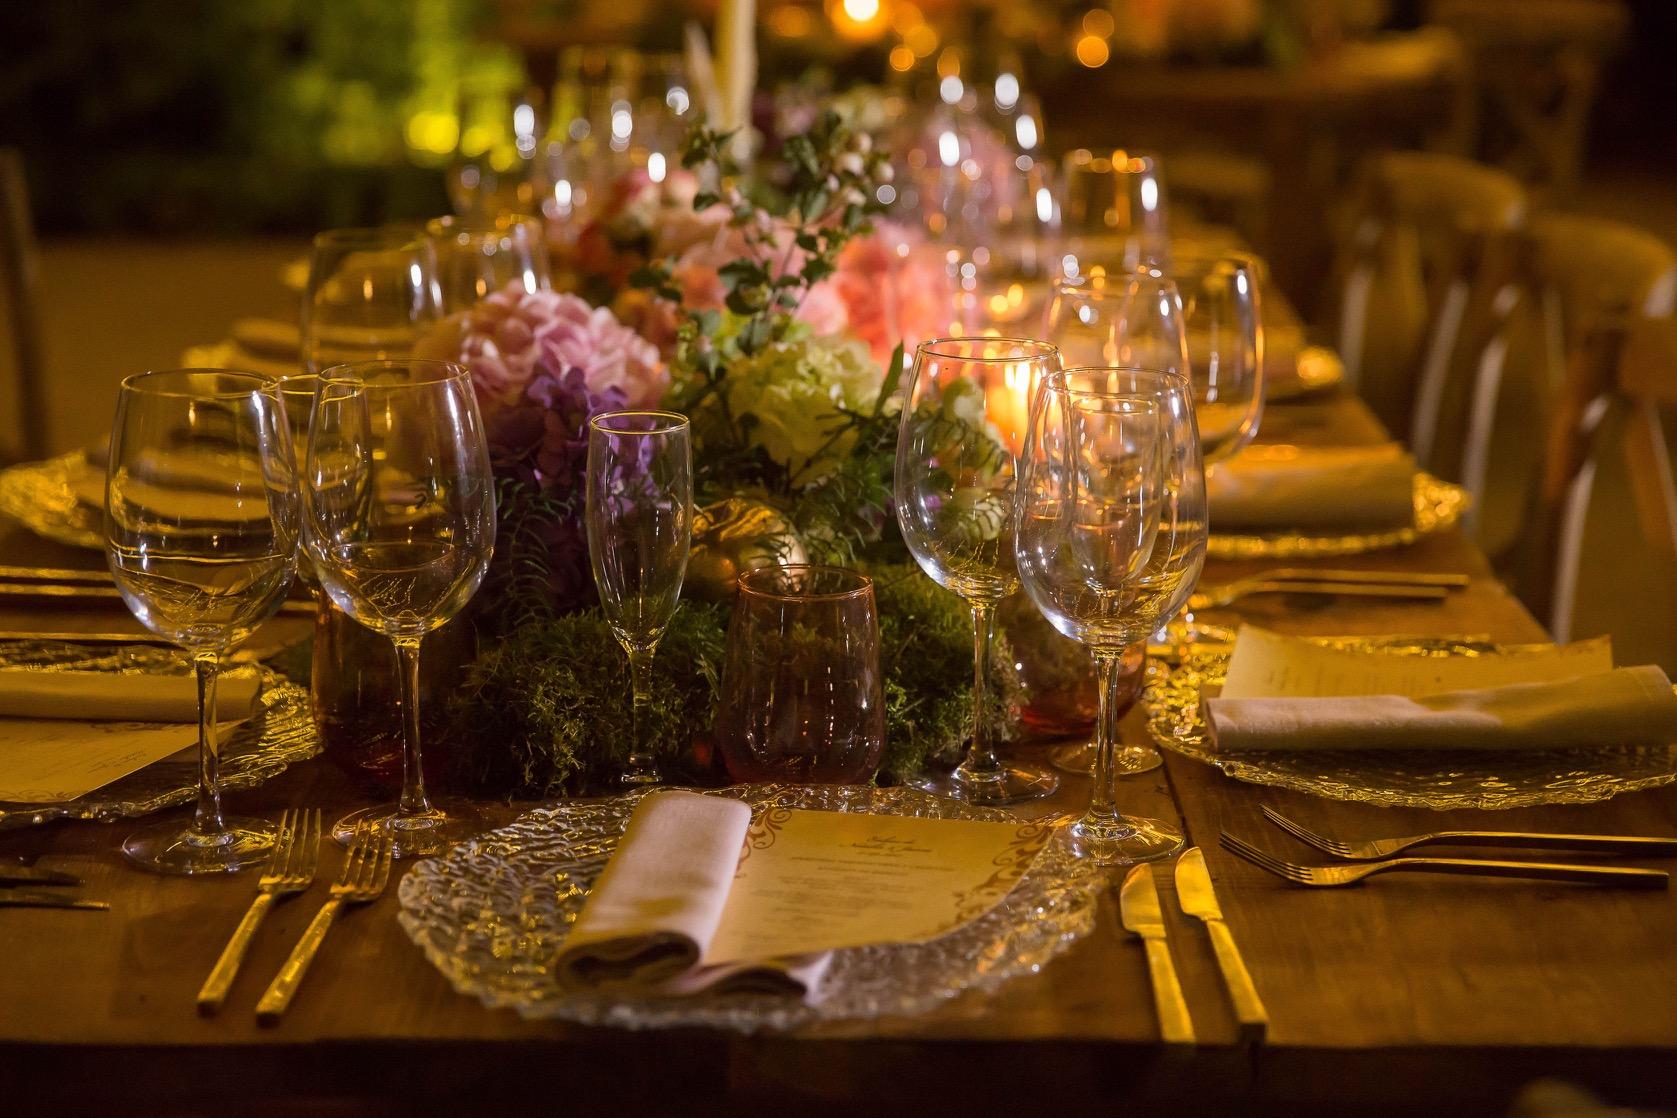 Si-Quiero-Wedding-Planner-By-Sira-Antequera-Bodas-Málaga-Marbella-Miami Natalia-Jaime-9